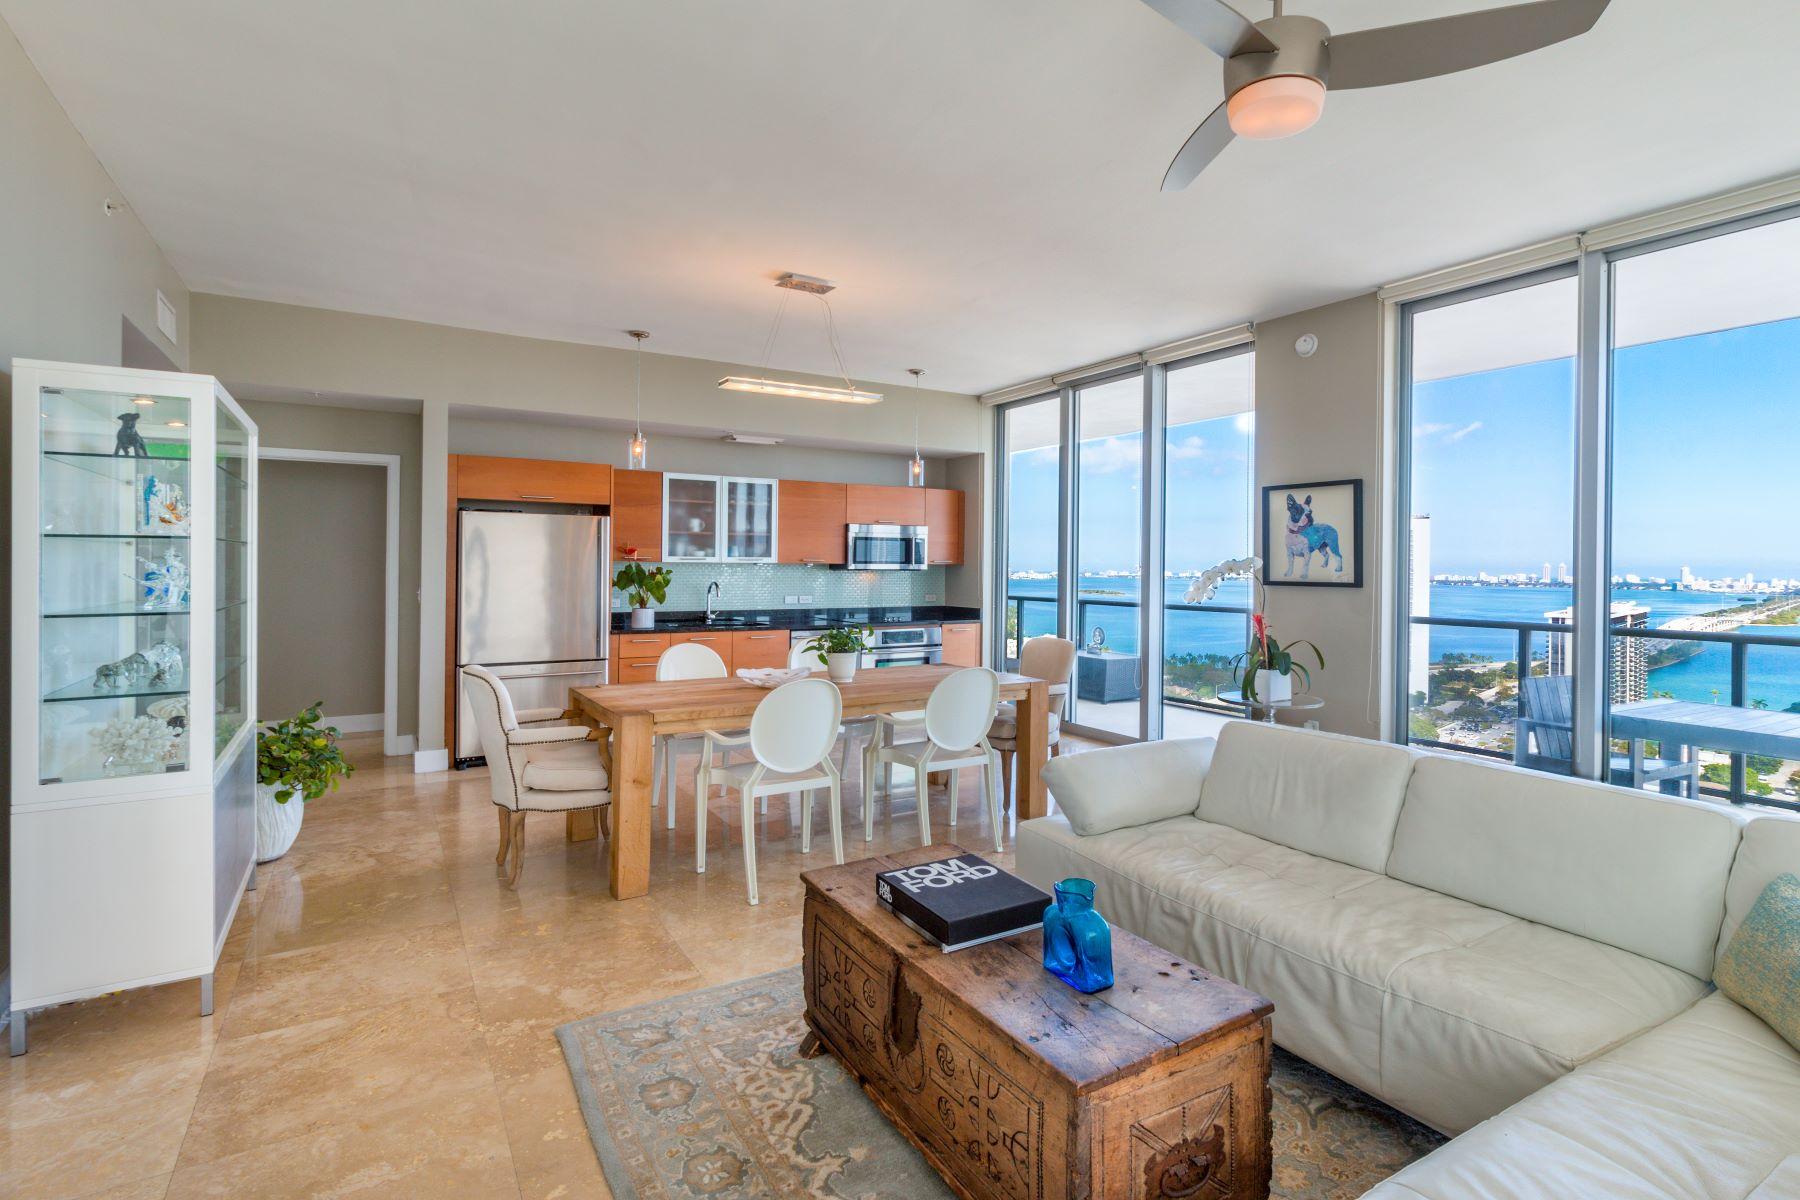 Condominium for Sale at 3470 E Coast Ave #H2609 3470 E Coast Ave H2609 Miami, Florida, 33137 United States